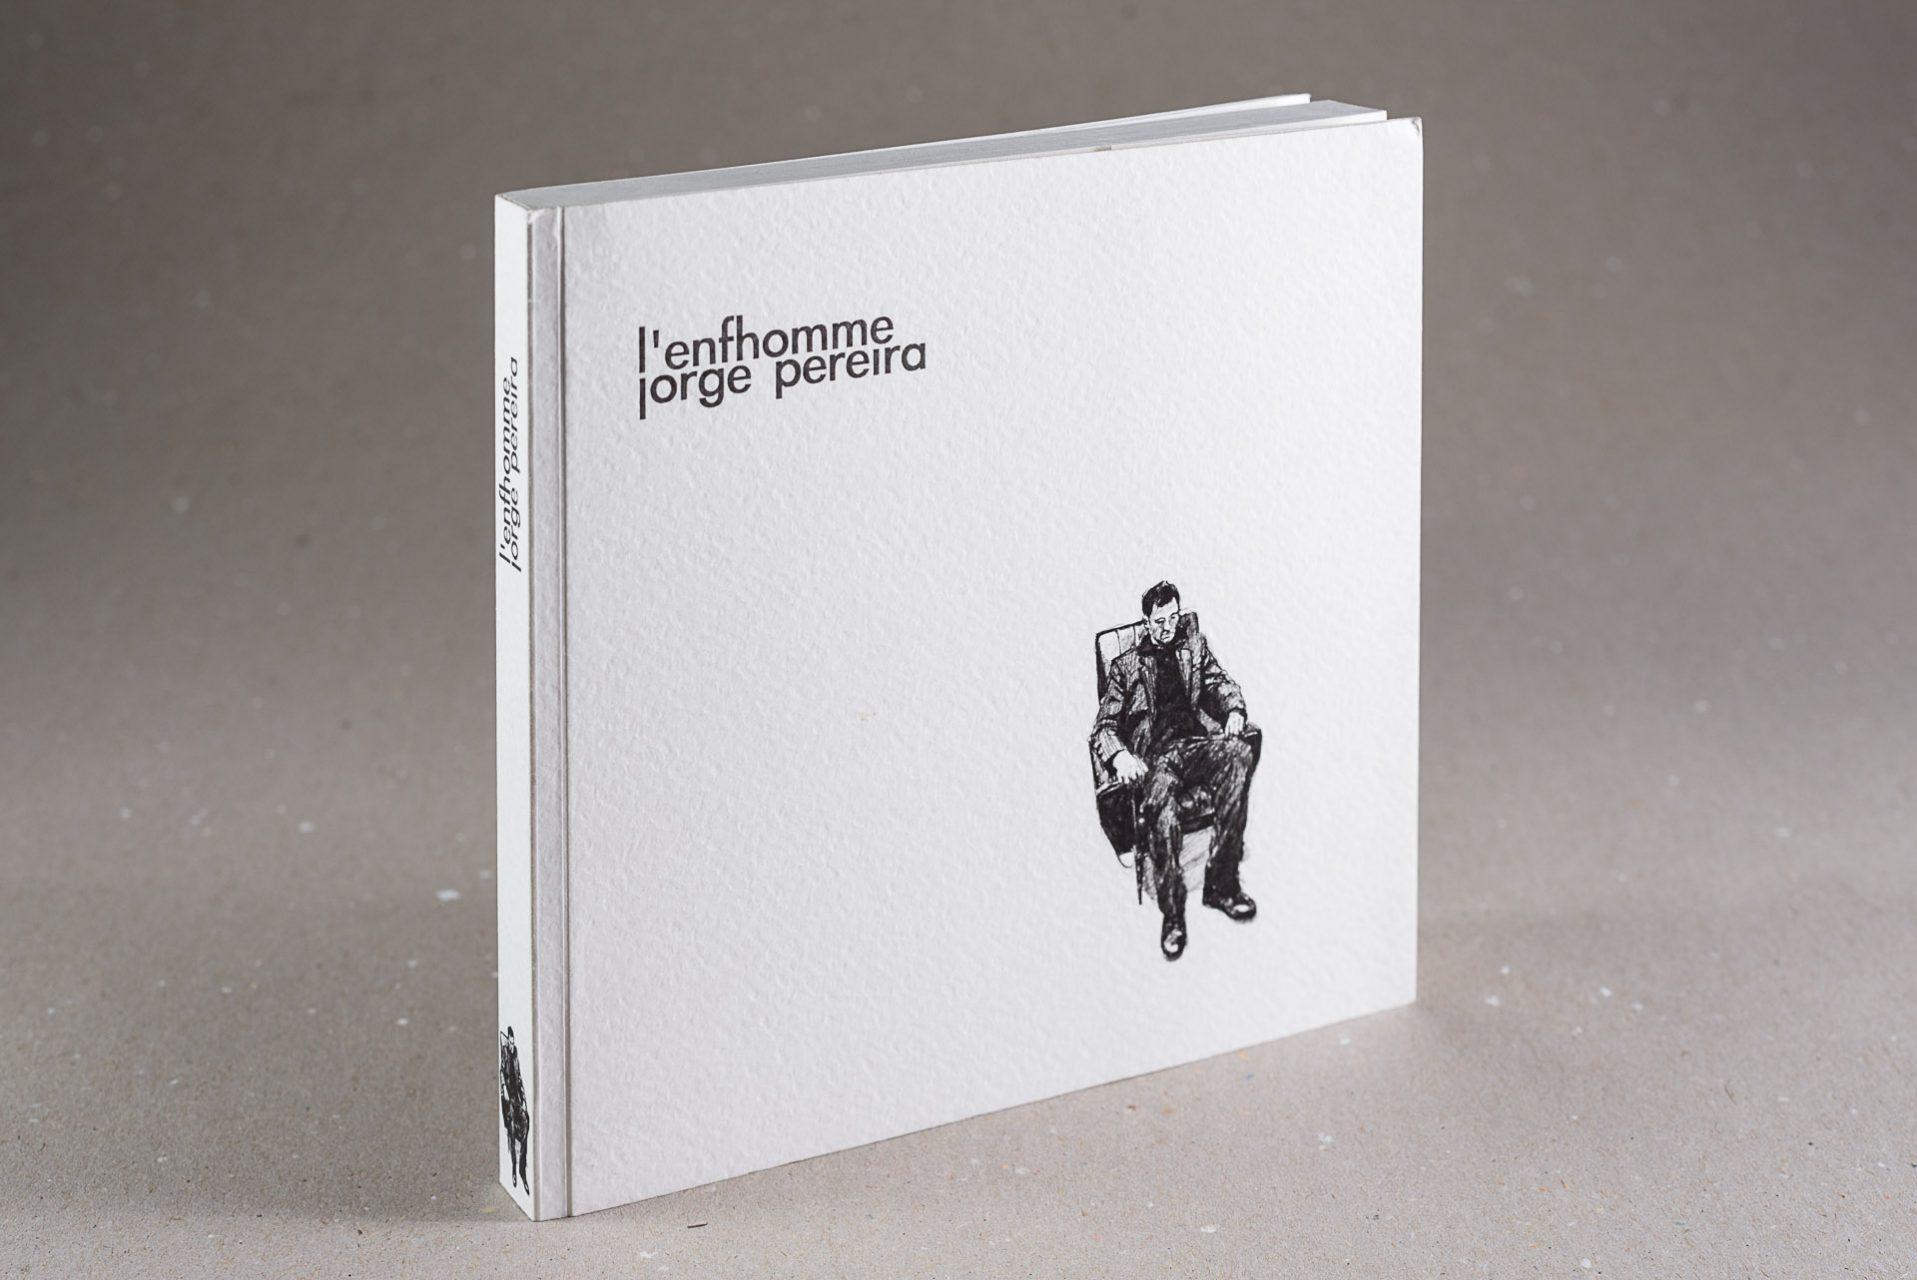 web-hd-nuit-myrtide-livre-l-enfhomme-jorge-pereira-01